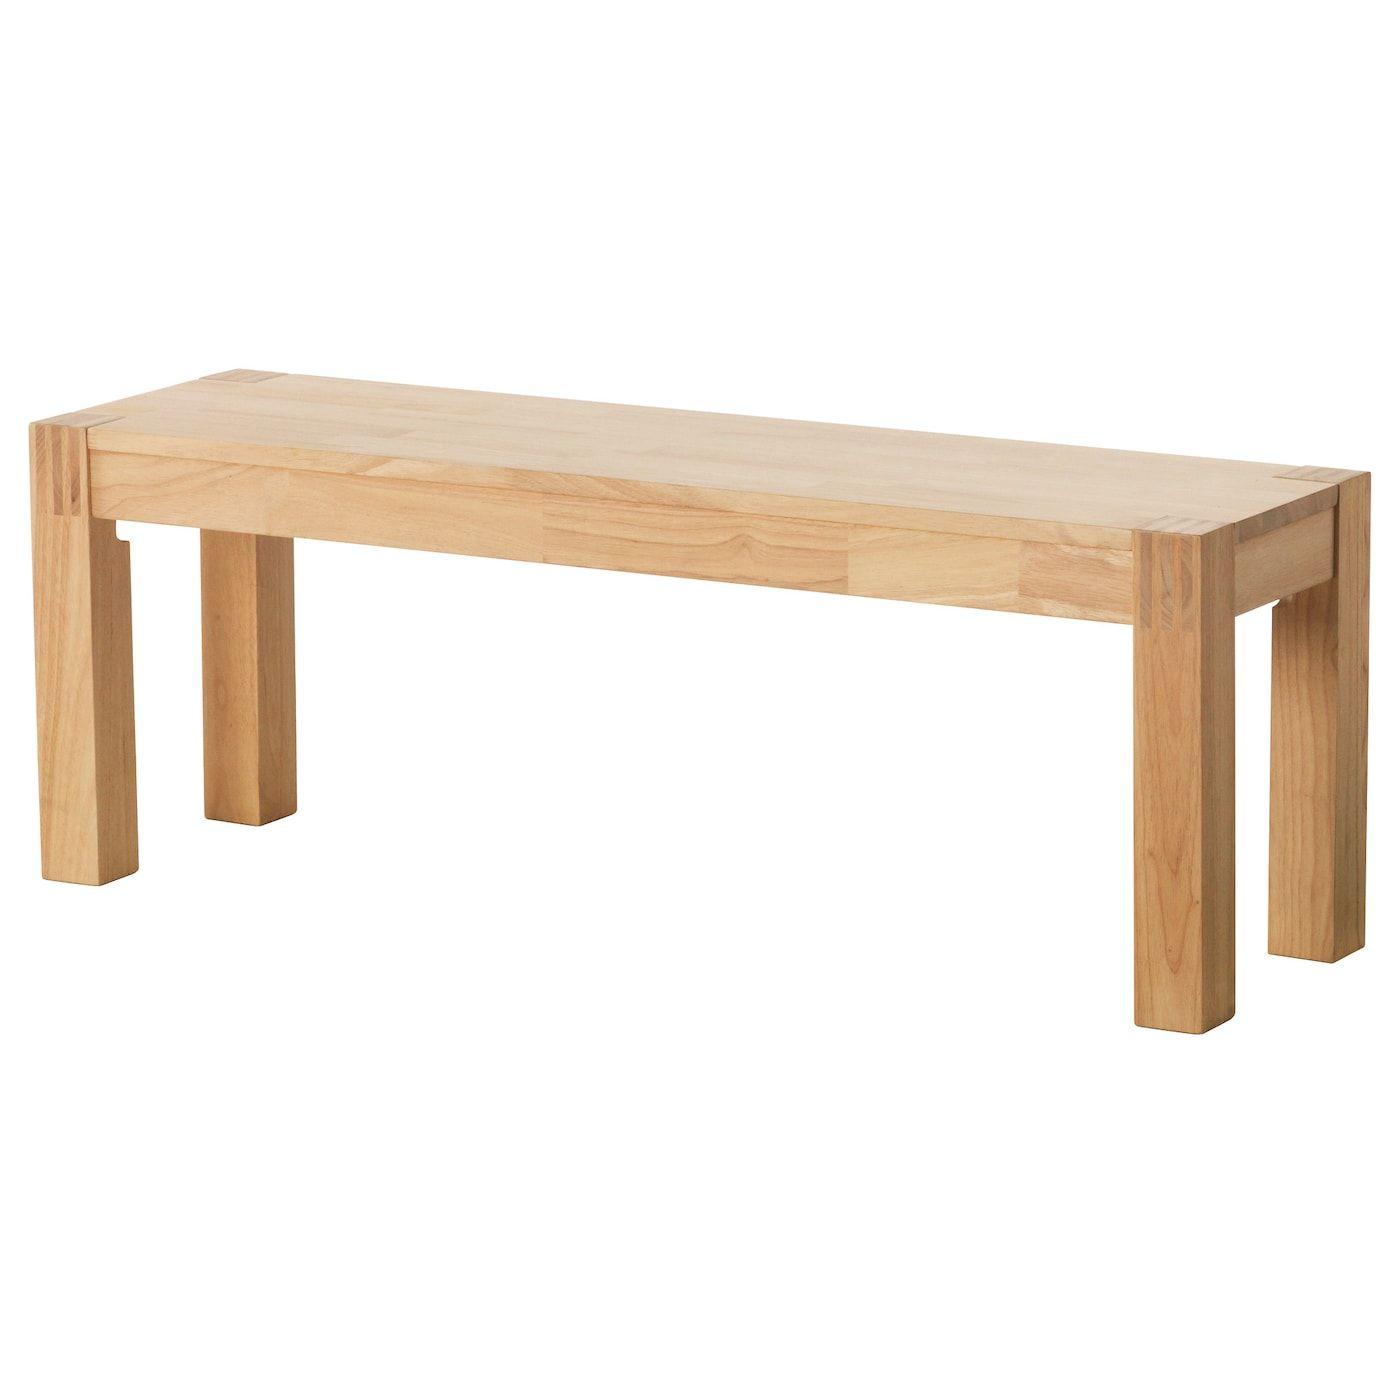 Nordby Bank Gummibaum Ikea Sitzbank Holz Ikea Ikea Stuhl